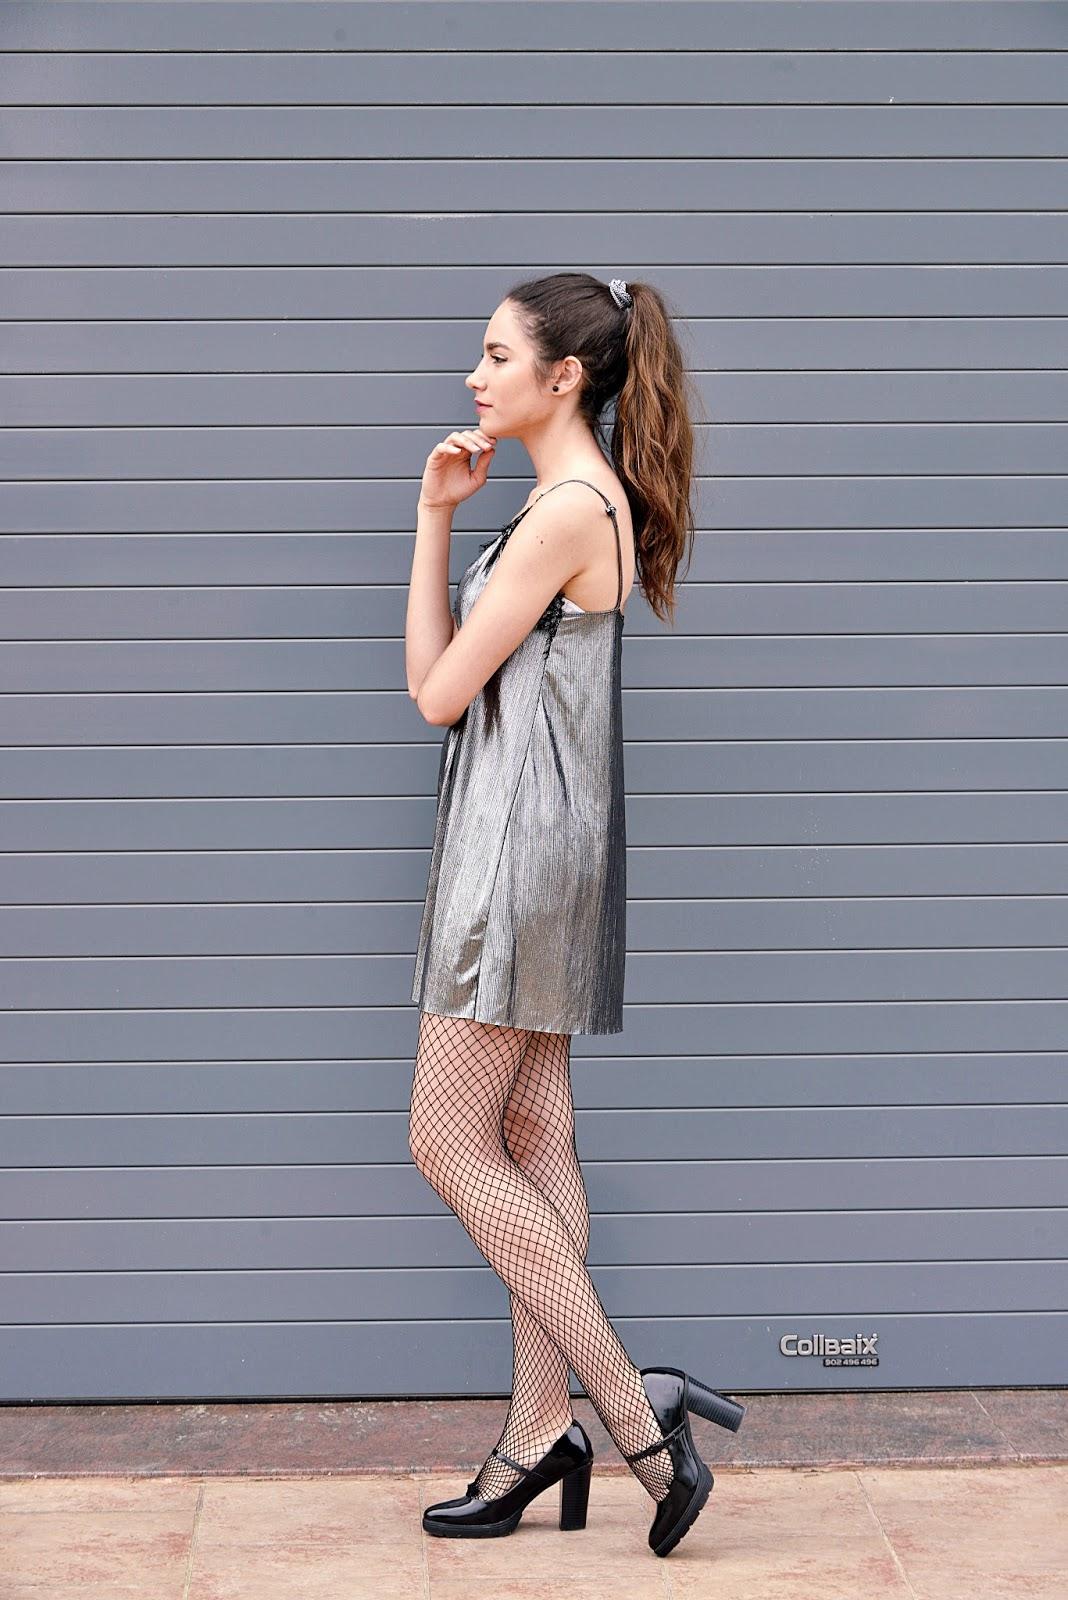 Street style legwear looks theperfectdisease.com